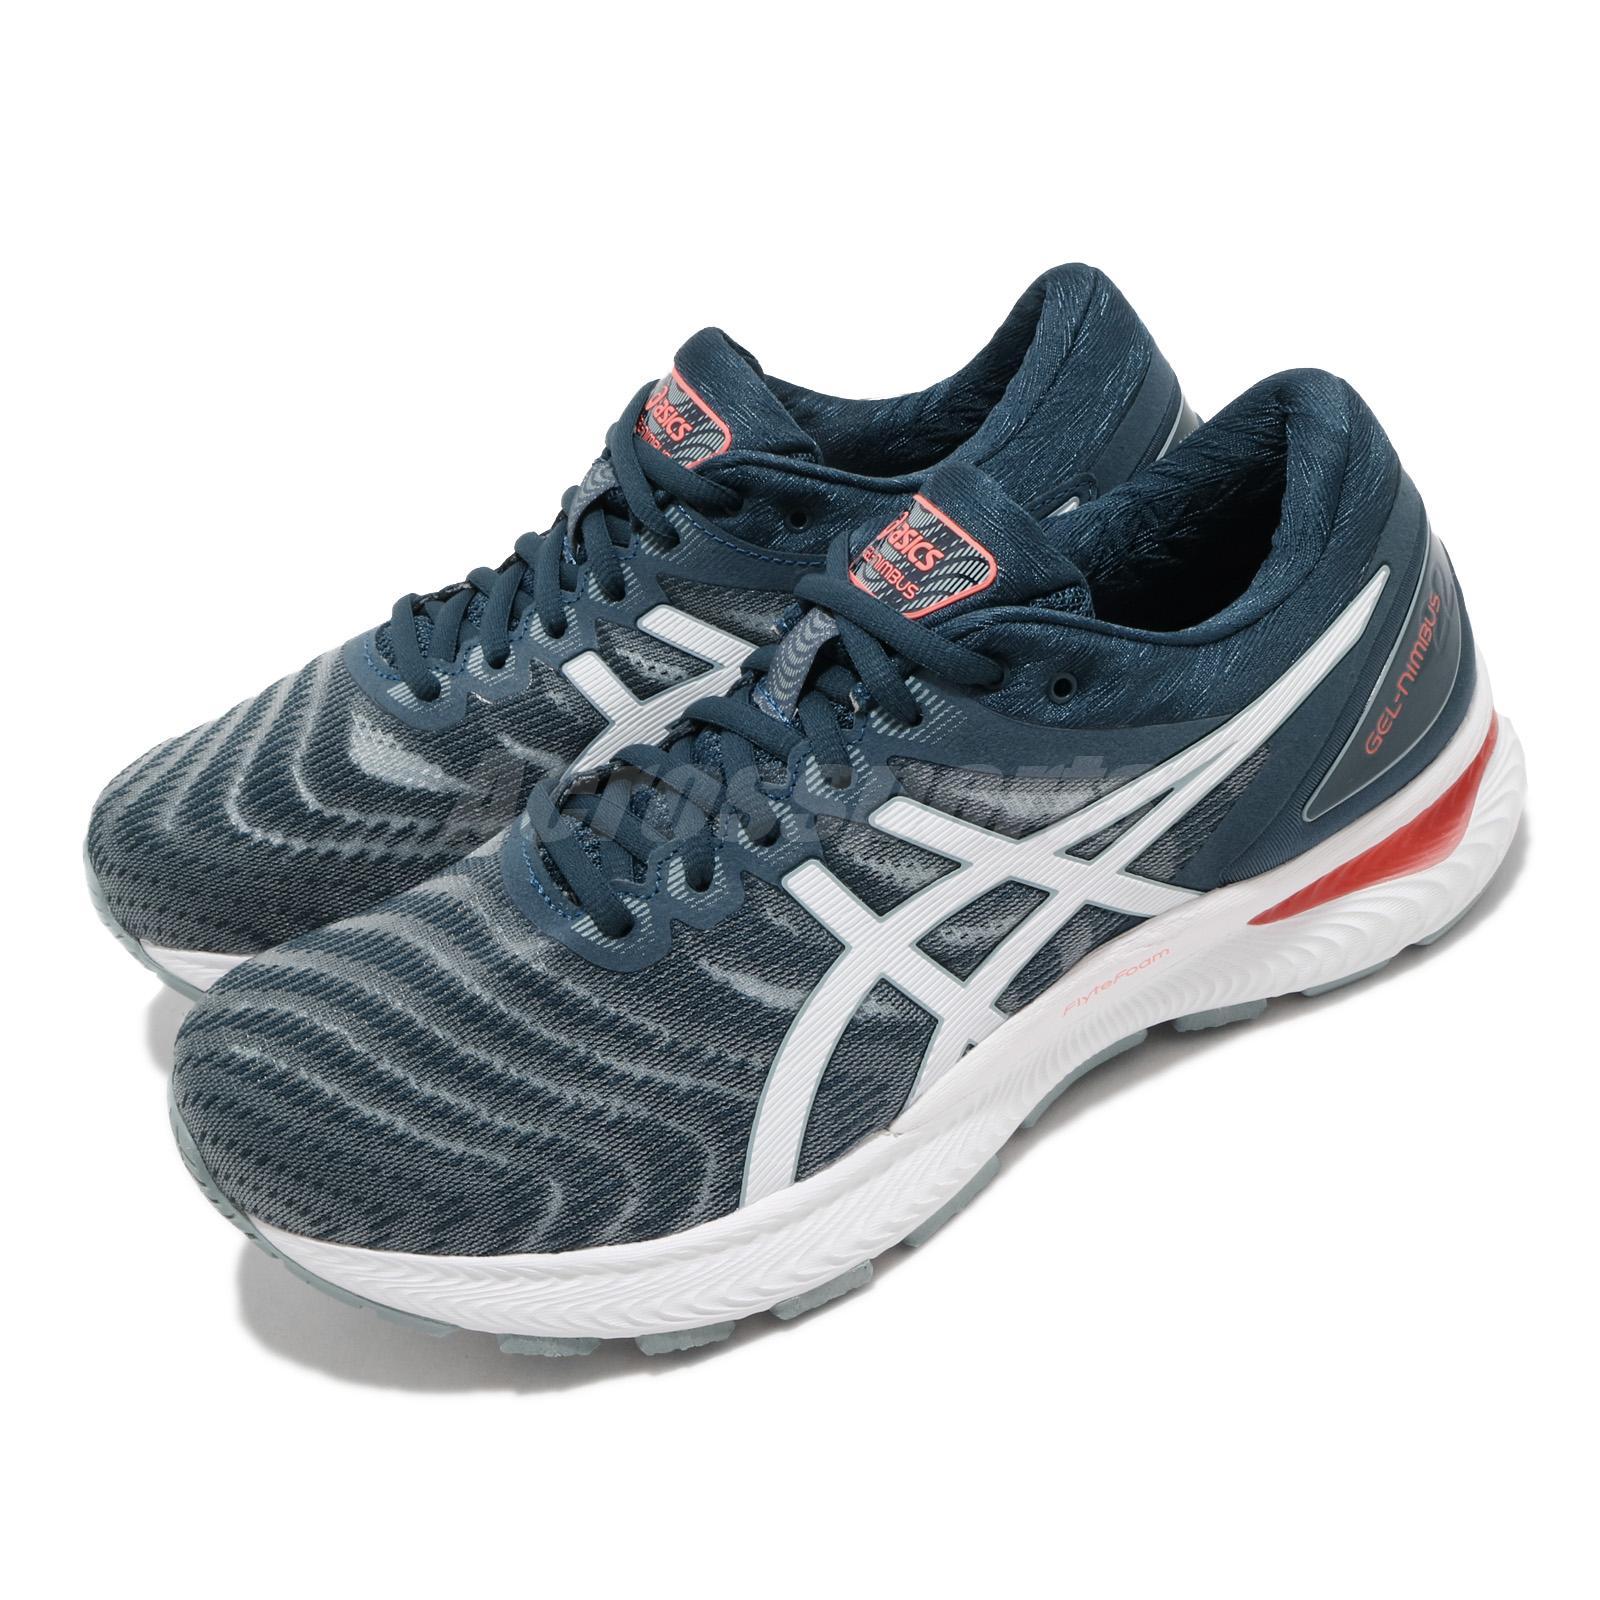 consonante cobre local  Asics Gel-Nimbus 22 4E Extra Wide Grey Blue White Men Running Shoes  1011A682-404 | eBay